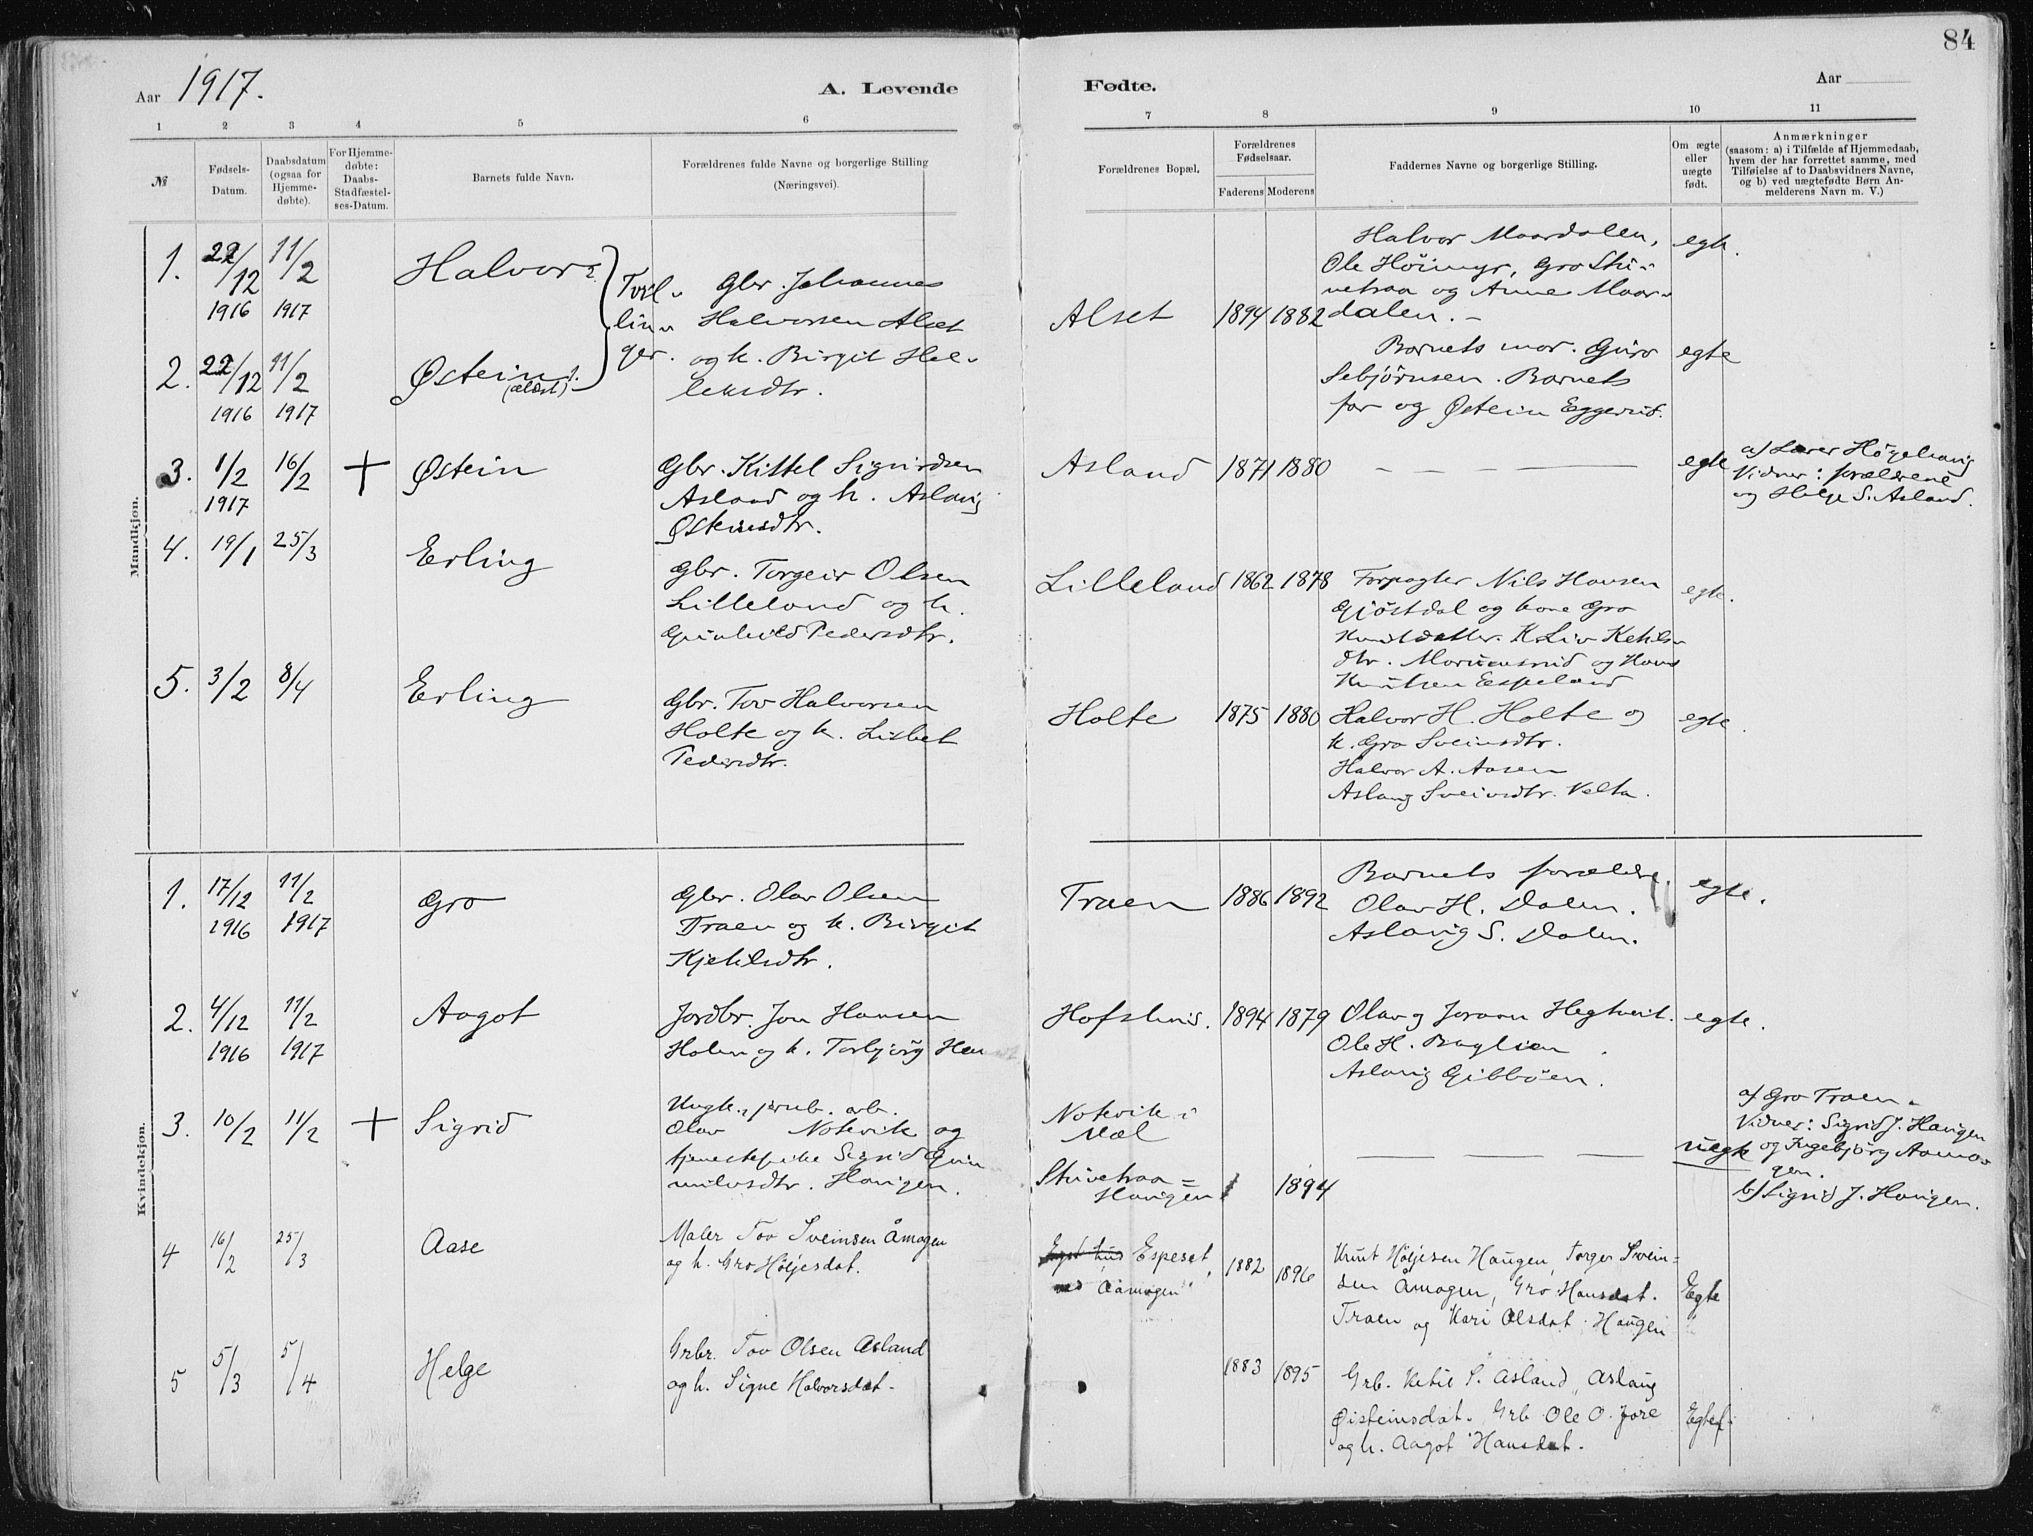 SAKO, Tinn kirkebøker, F/Fa/L0007: Ministerialbok nr. I 7, 1878-1922, s. 84